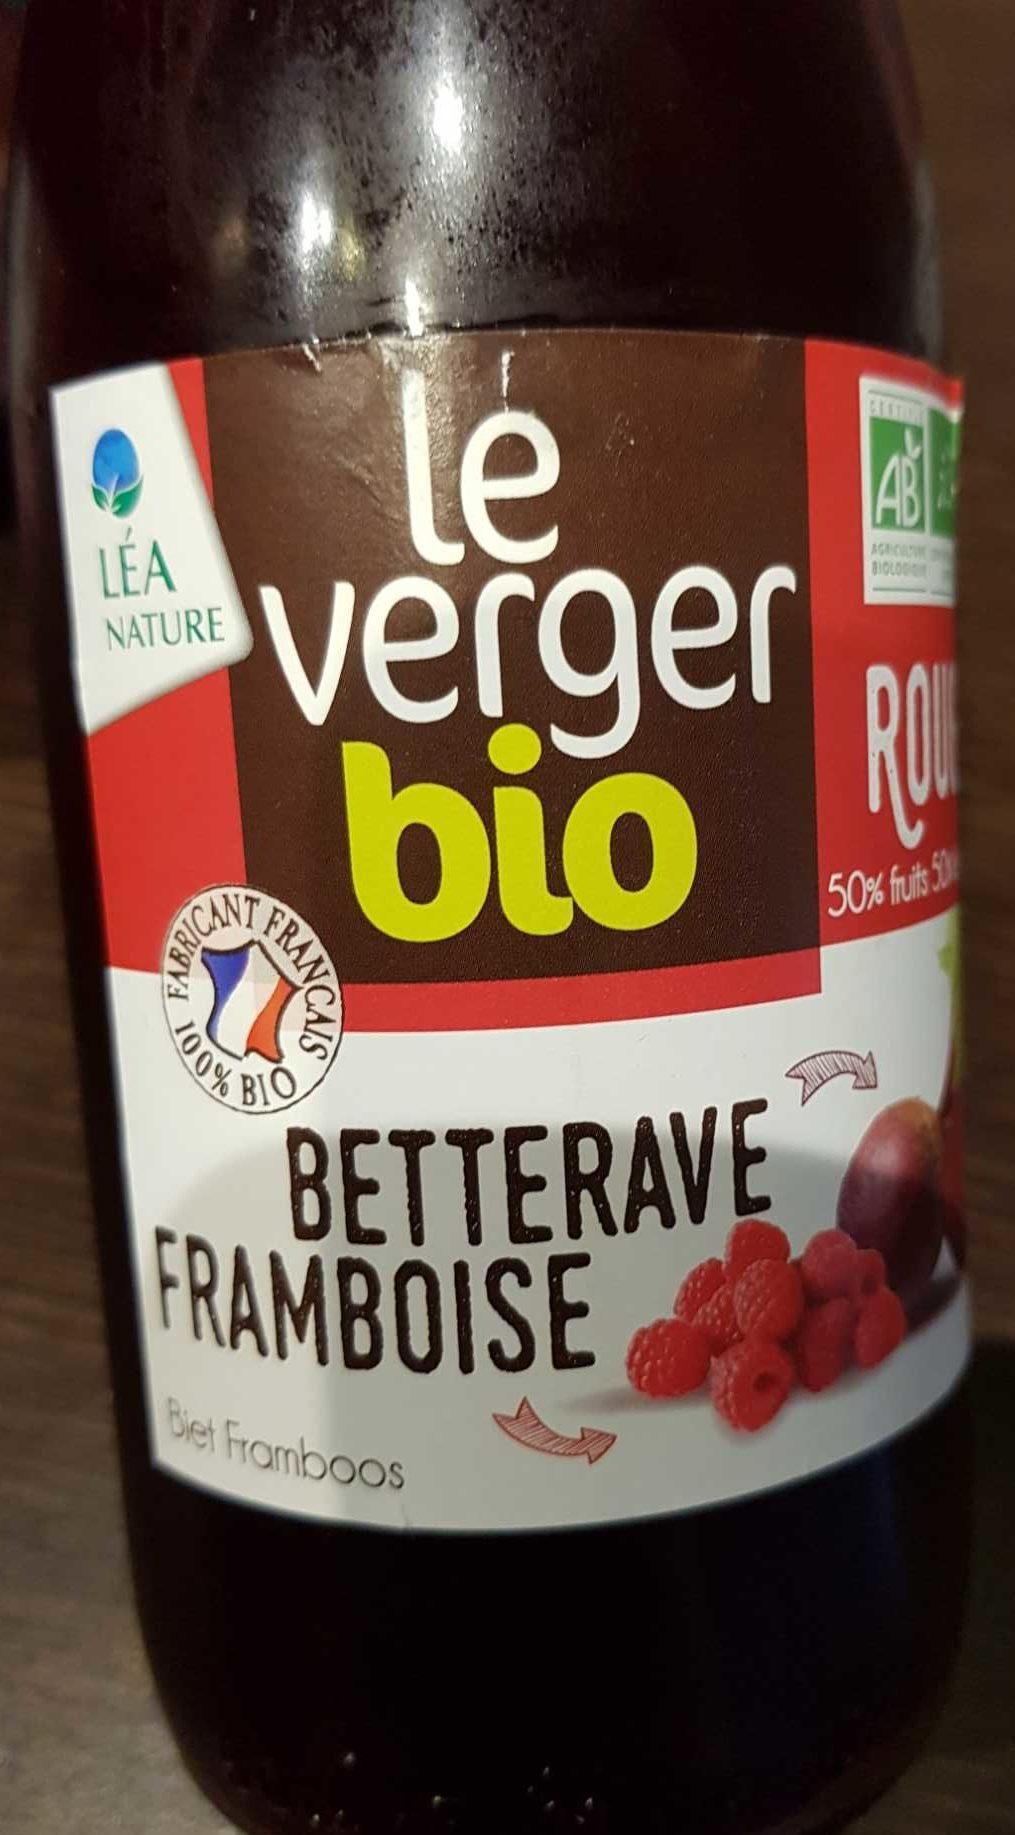 Jus betterave framboises - Product - fr